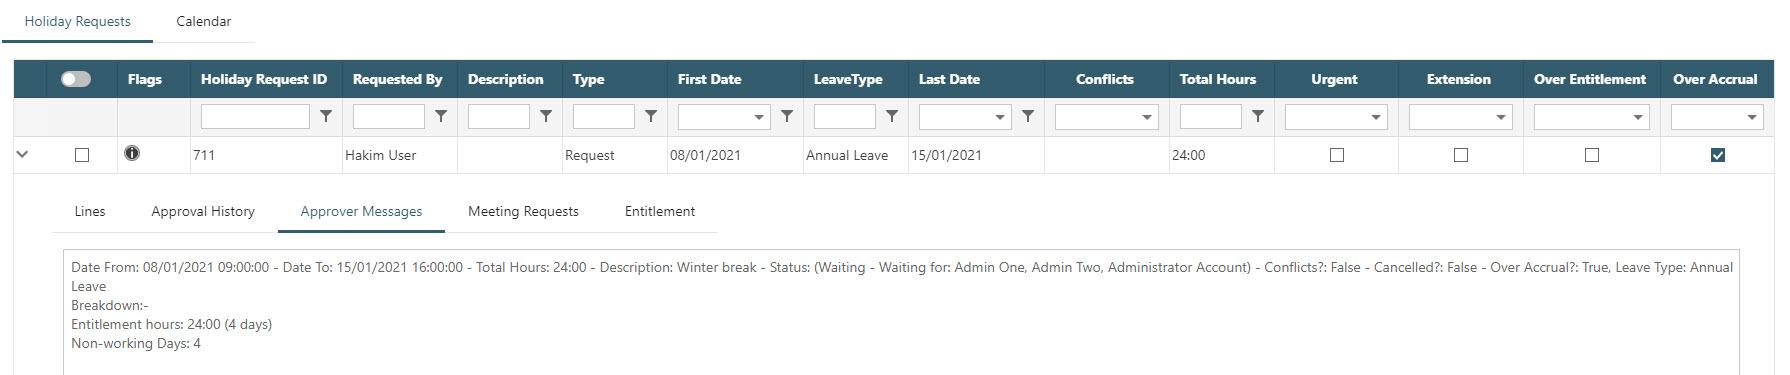 Sicon WAP Holidays Help and User Guide - WAP Holidays HUG Section 16.3 - WAP Holidays HUG Section 16.3 - Image 3